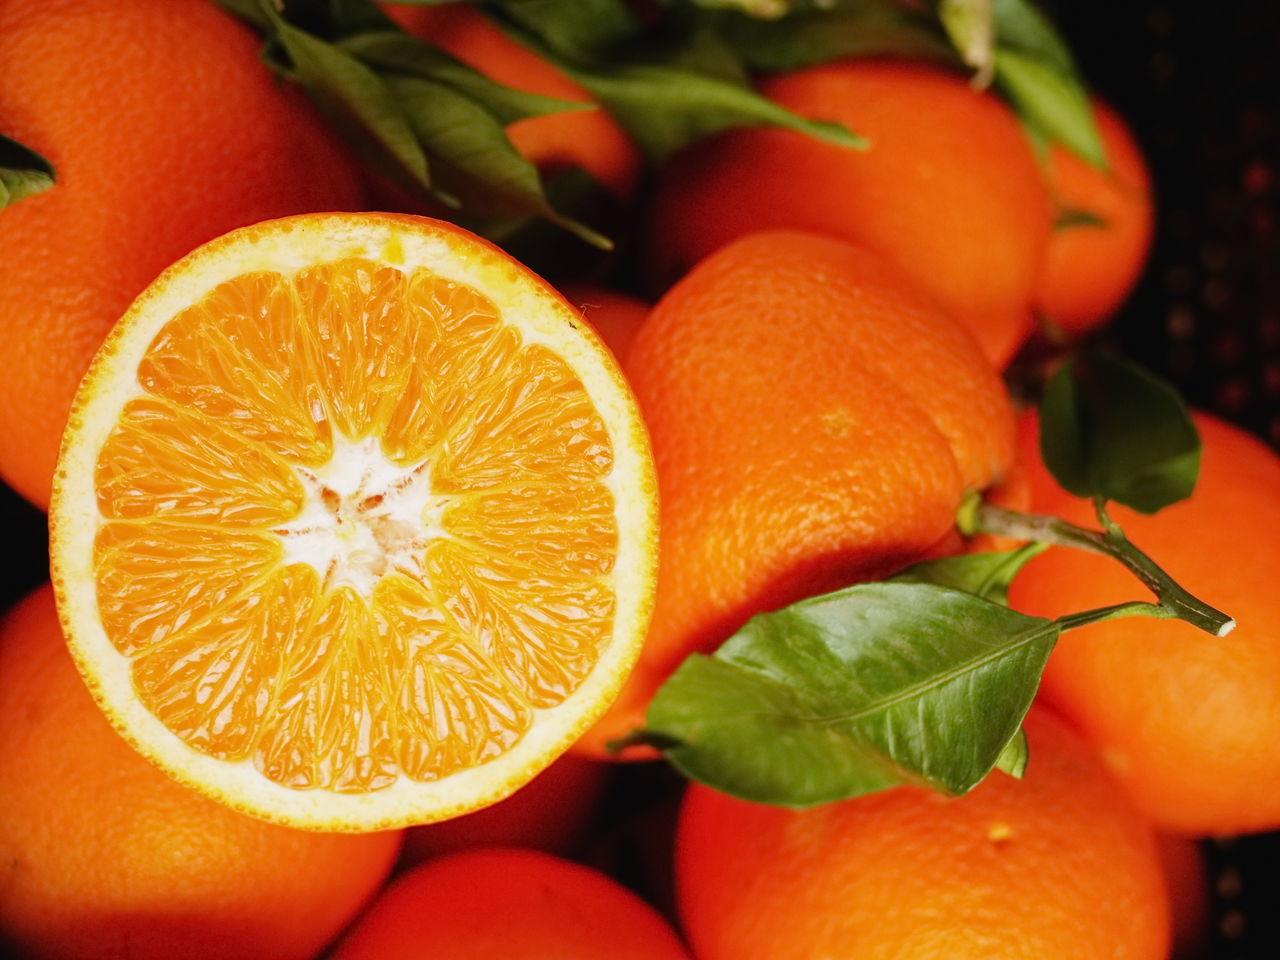 Citrus Fruit Close-up Day Food Food And Drink Freshness Fruit Healthy Eating No People Orange - Fruit Orange Color Orange Tree Outdoors